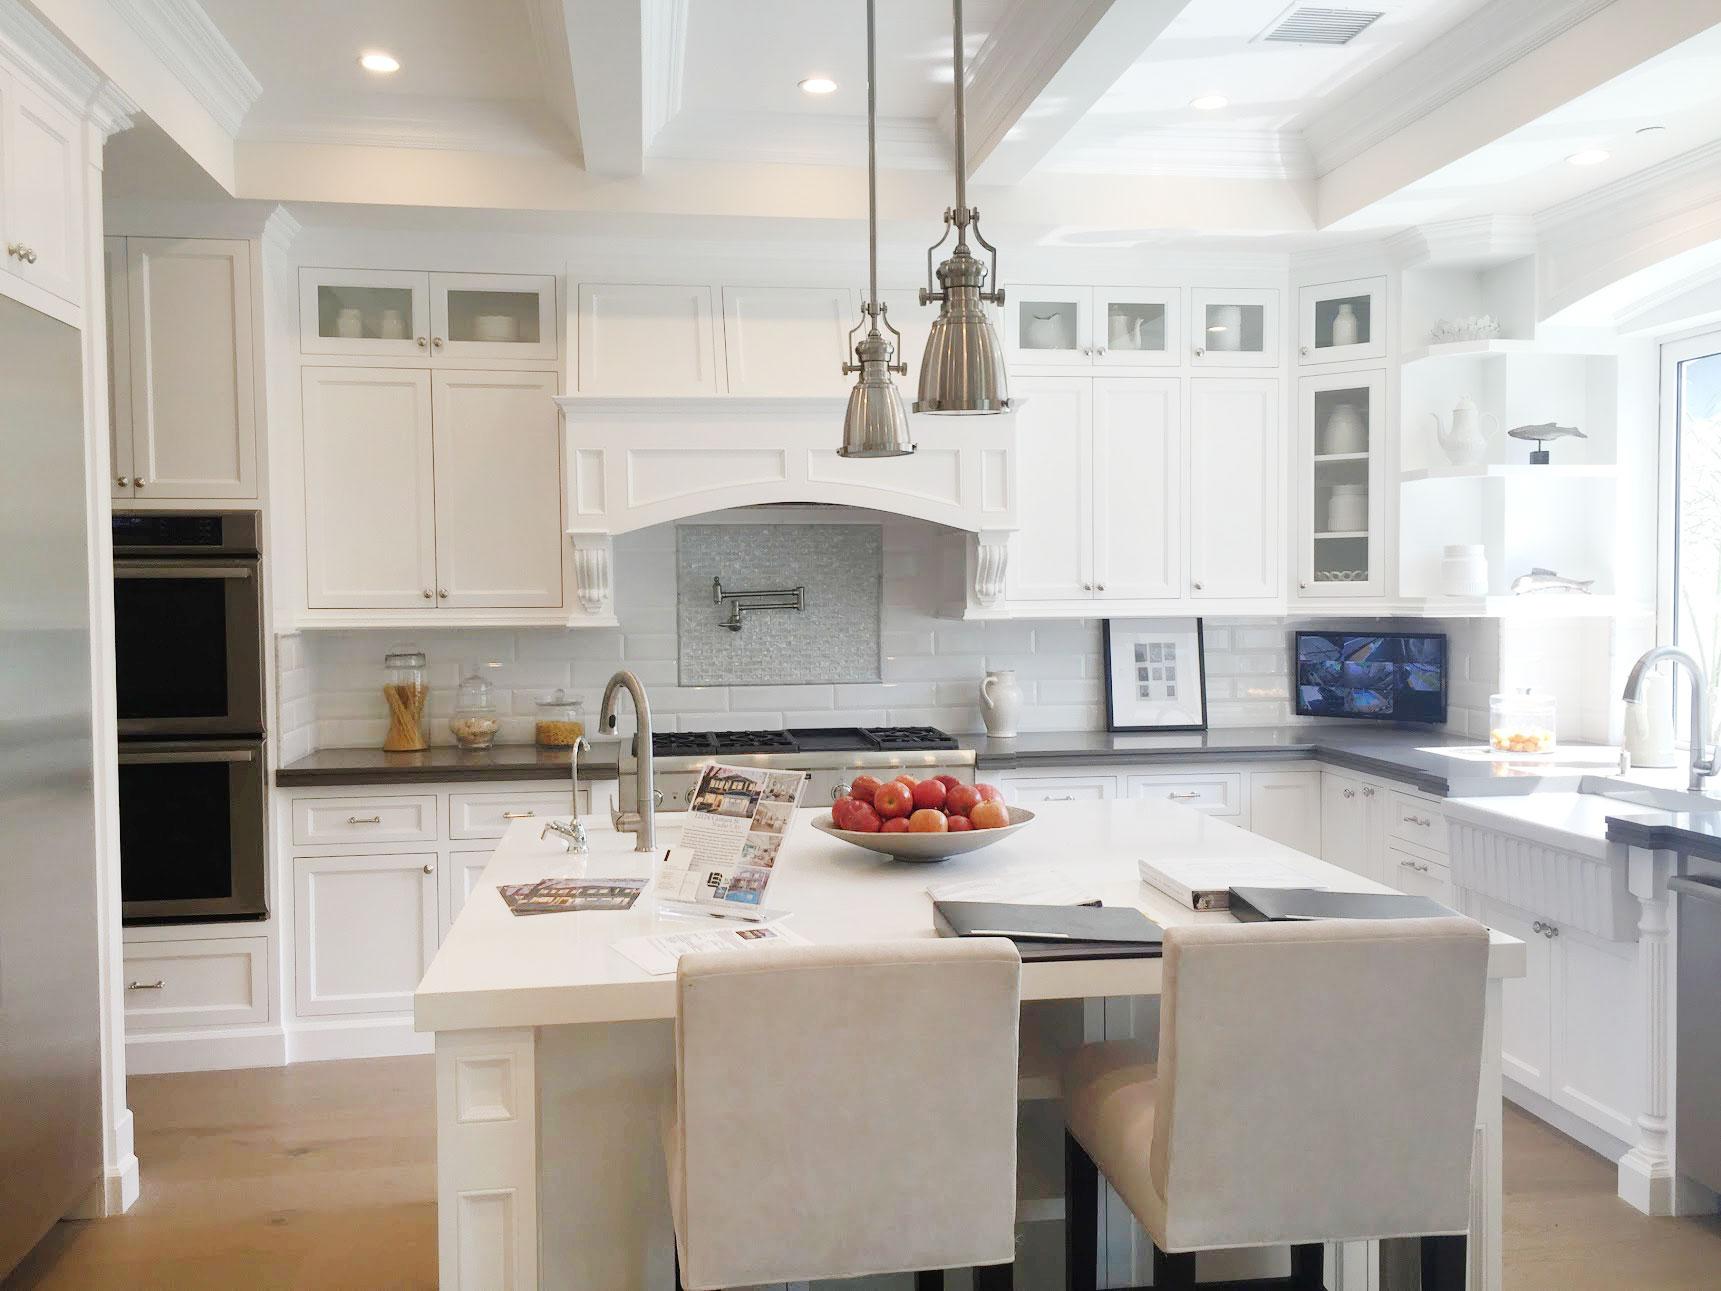 agoura-hills-kitchen-remodeling